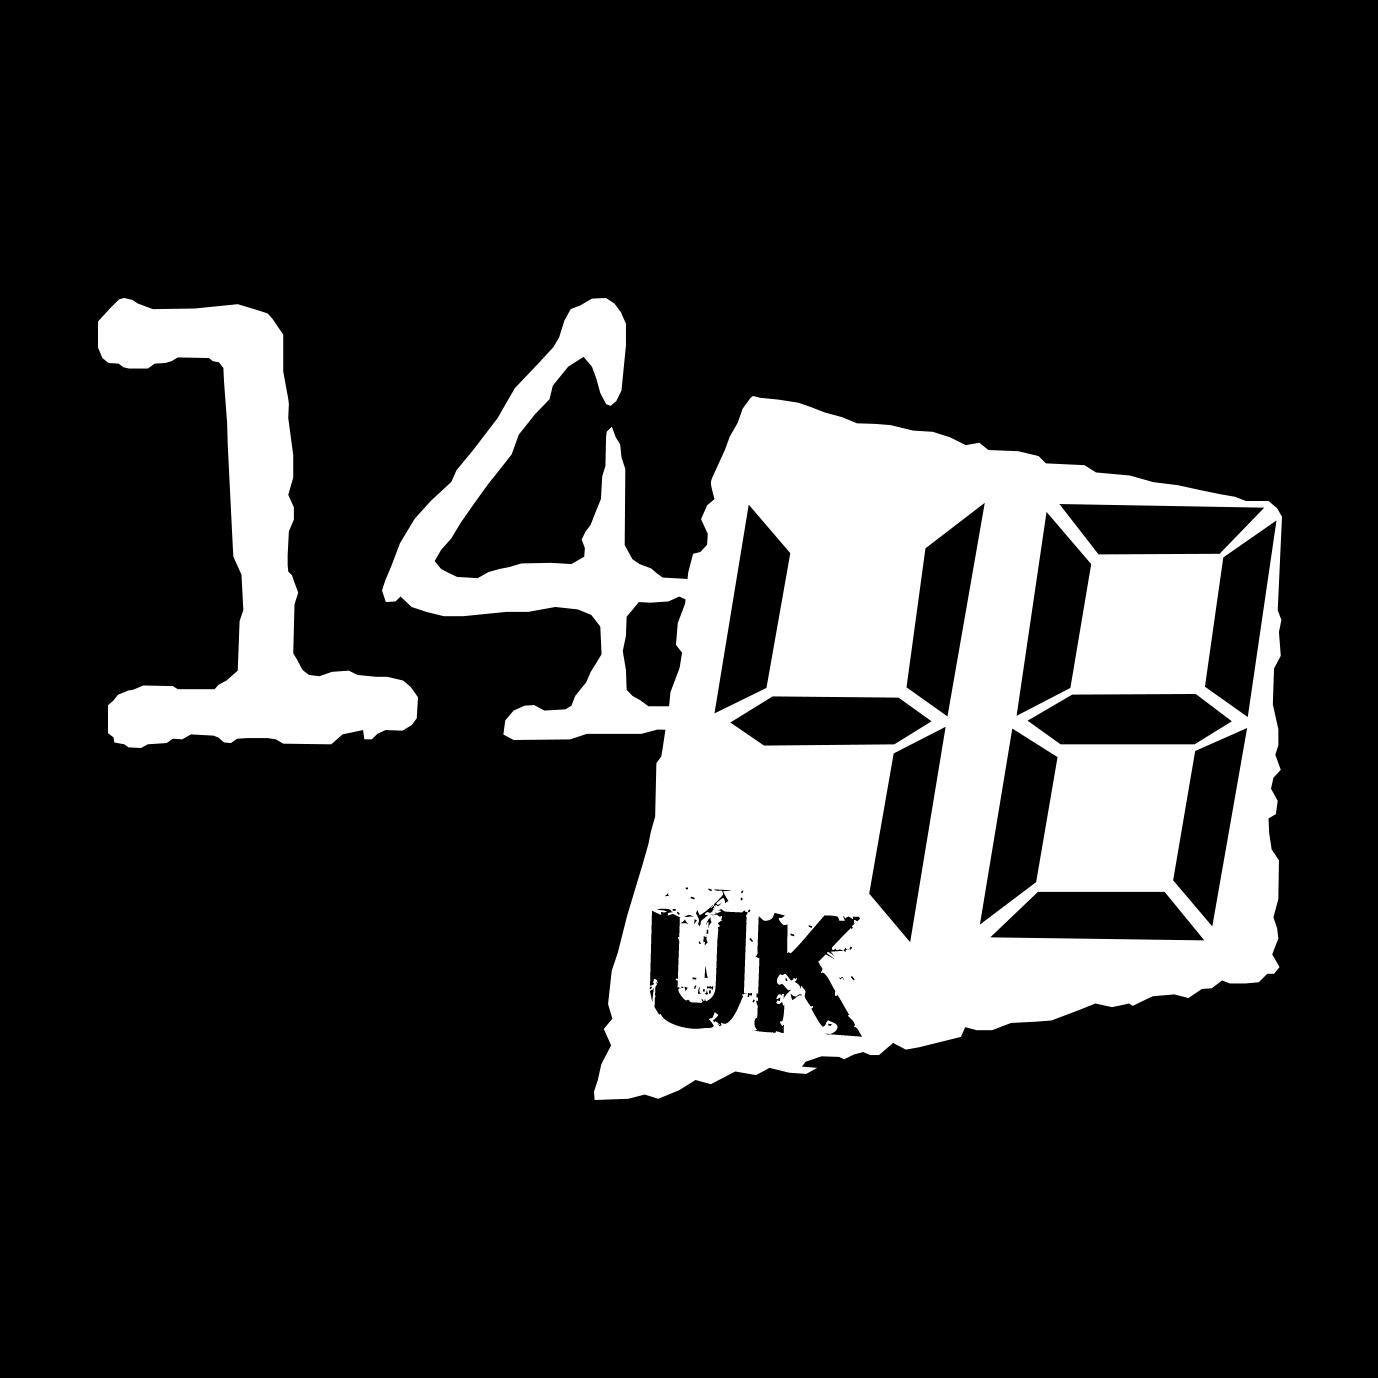 14/48 Leicester/Wolverhampton